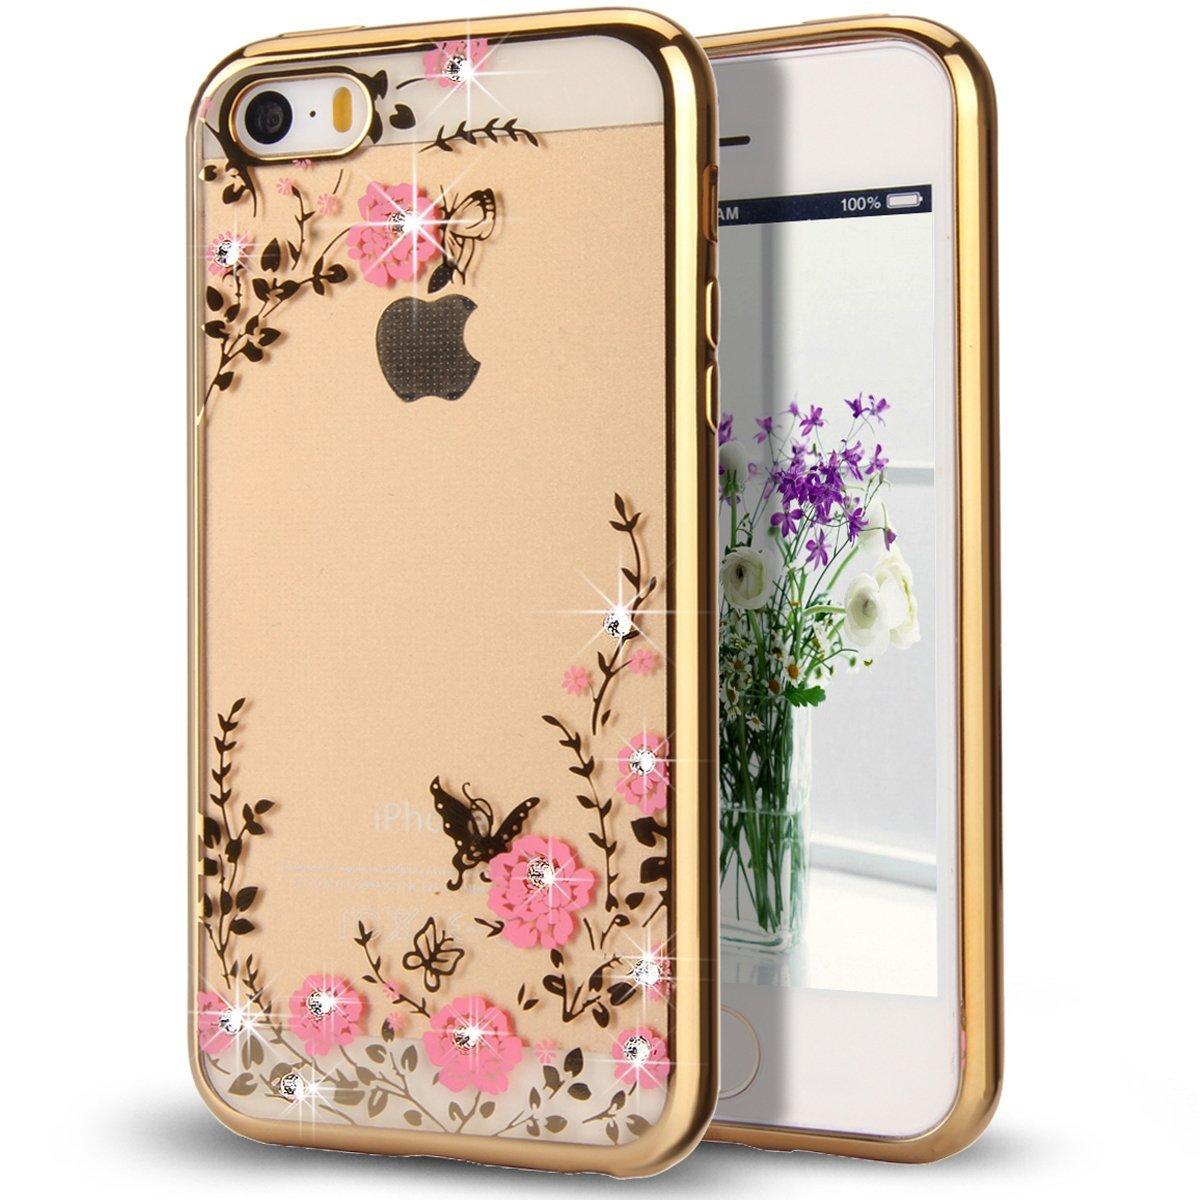 Obal / kryt Crystal Flowers pro iPhone SE / 5s / 5 - Zlatý (gold)